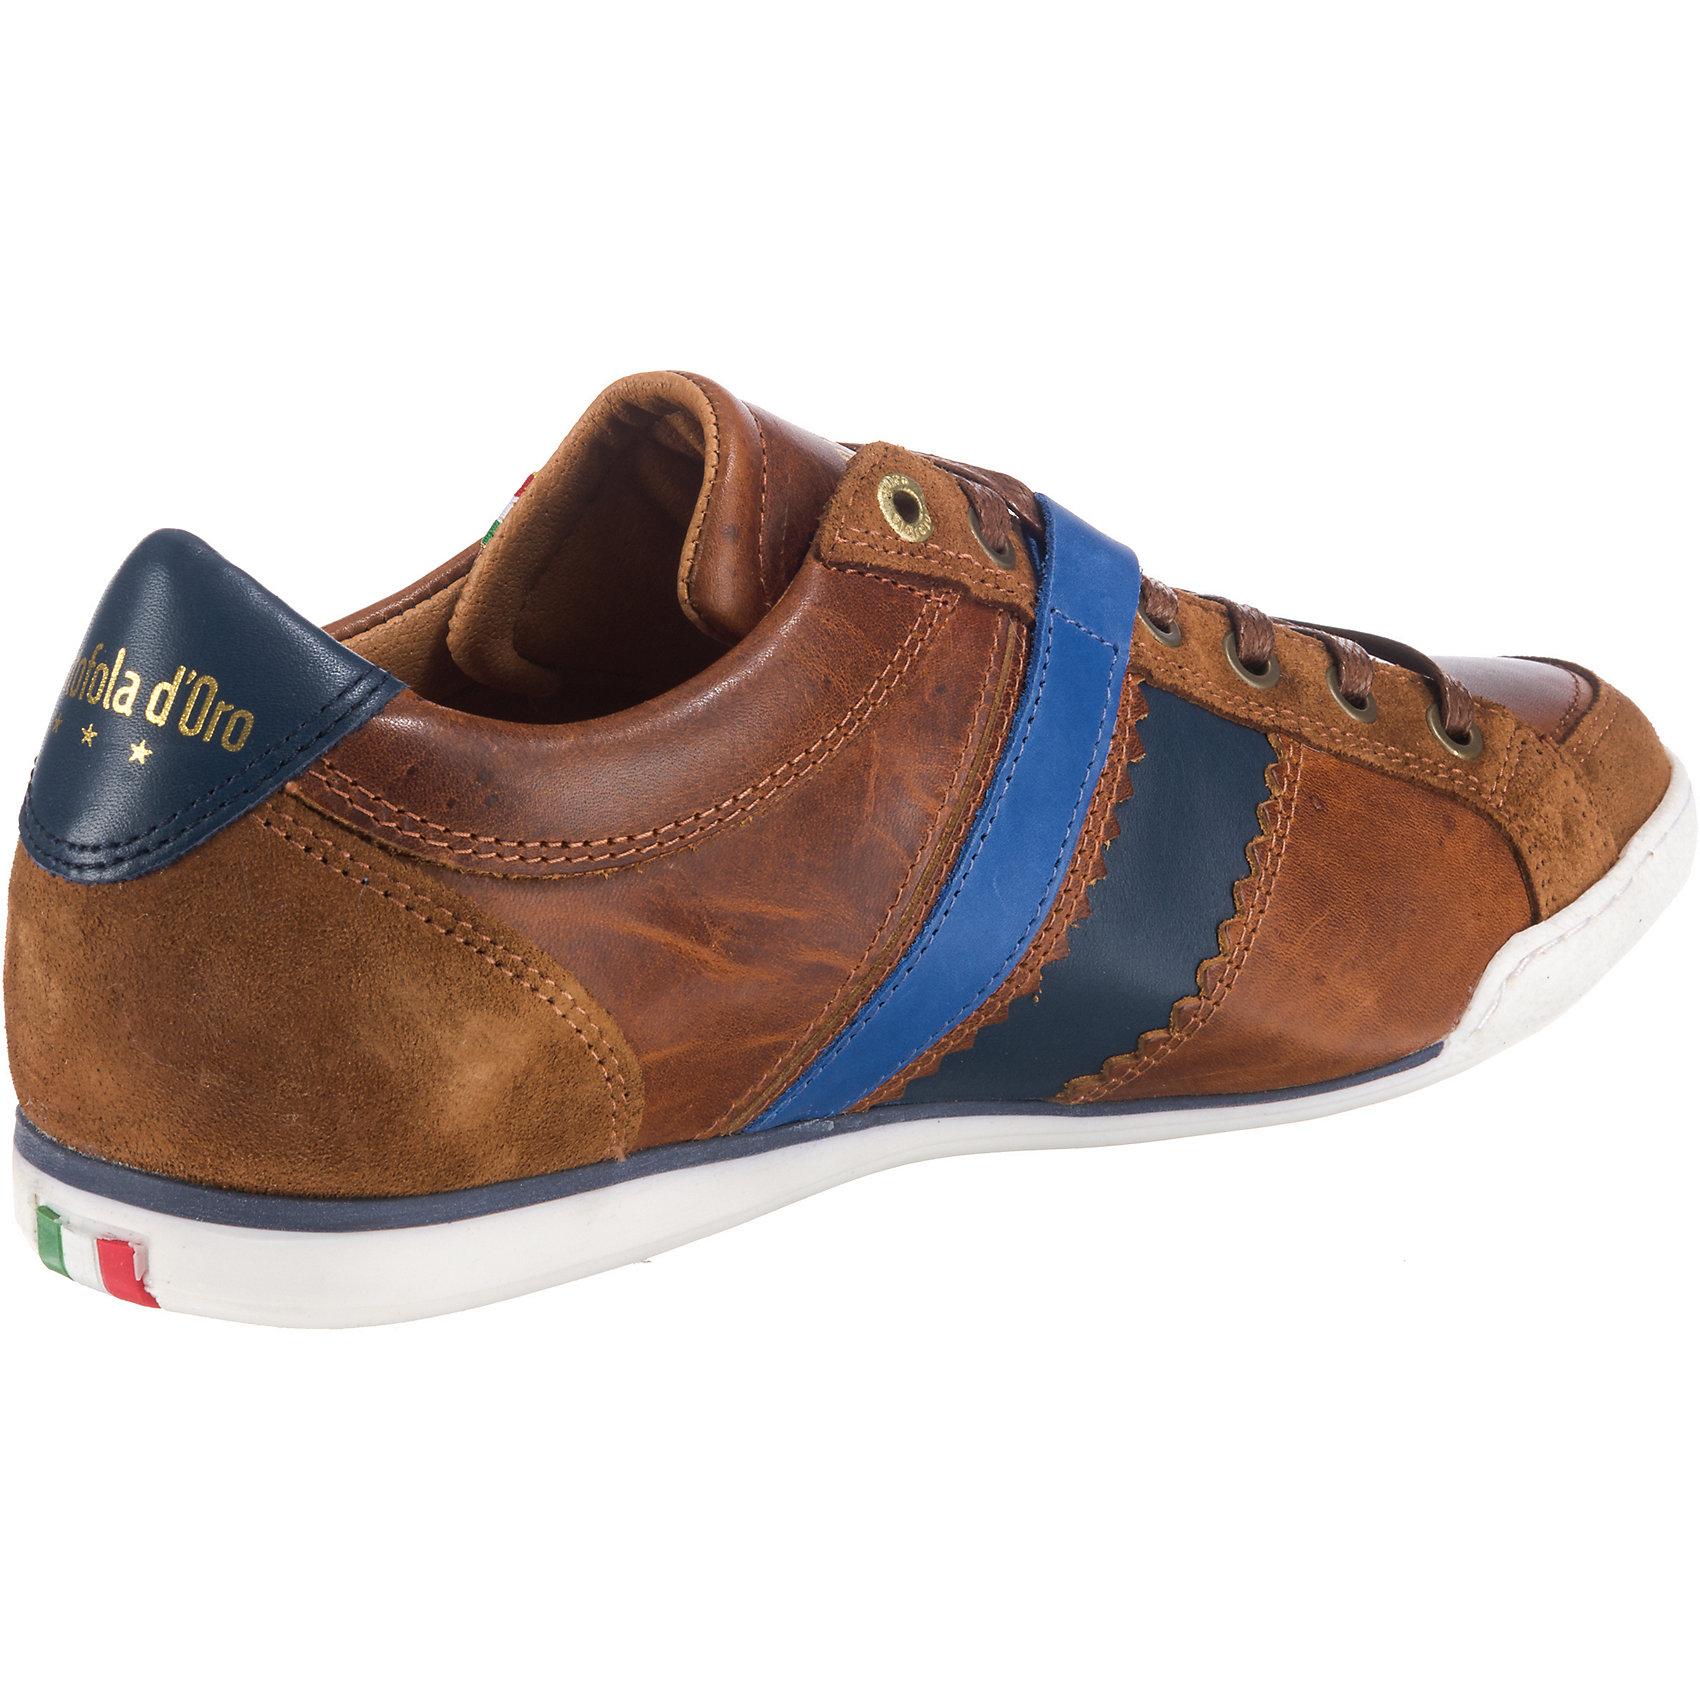 Neu Pantofola d'Oro 7283261 SAVIO ROMAGNA UOMO LOW Sneakers Low 7283261 d'Oro für Herren fe4dee